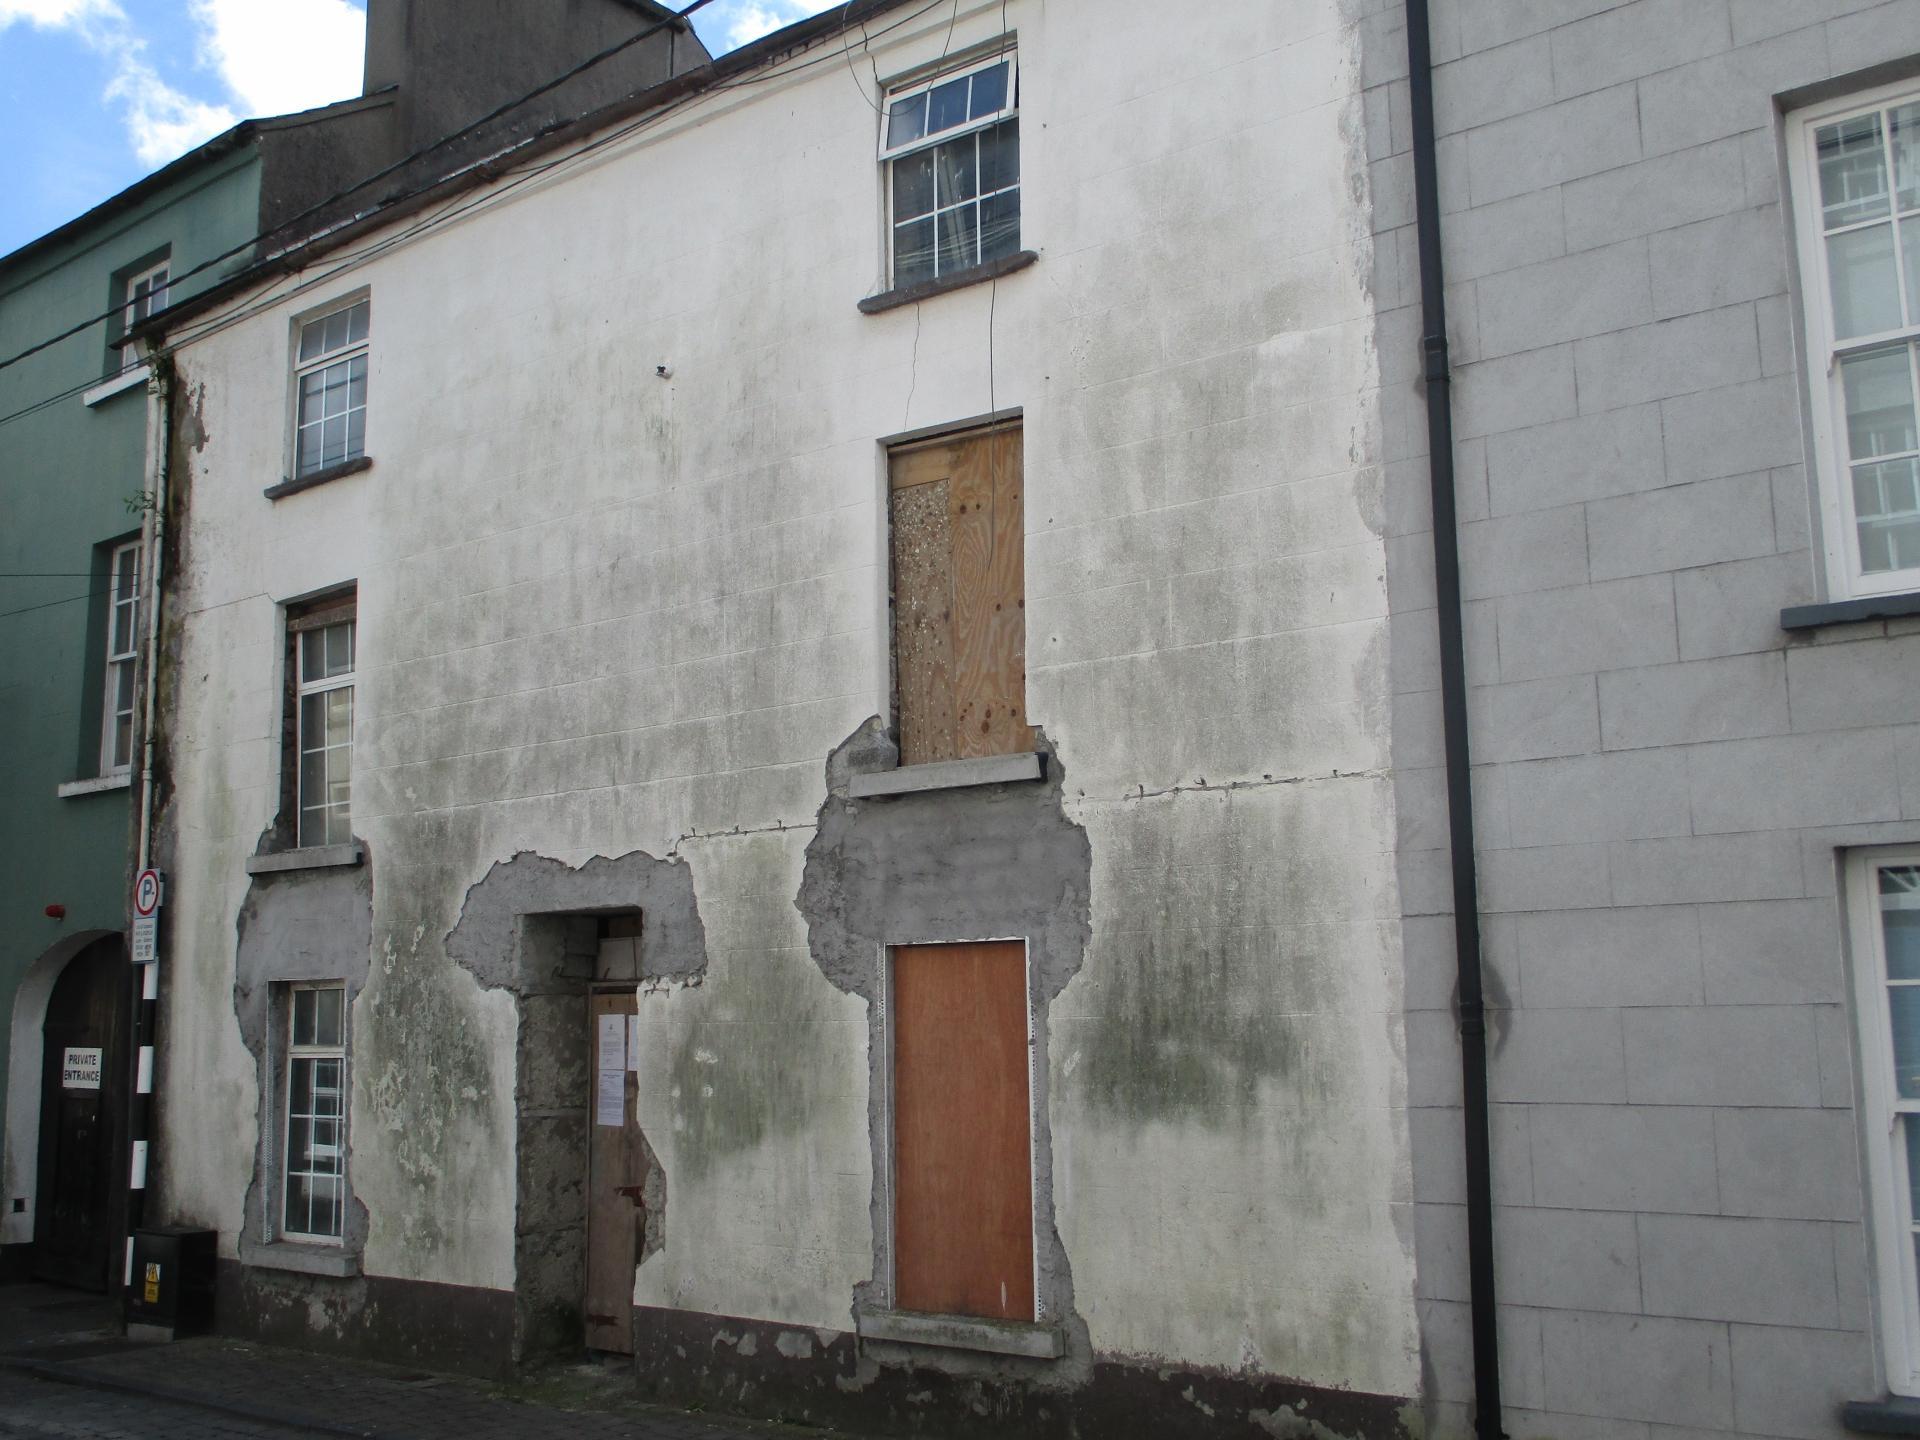 Kilkenny City & Environs Development Plan 2014